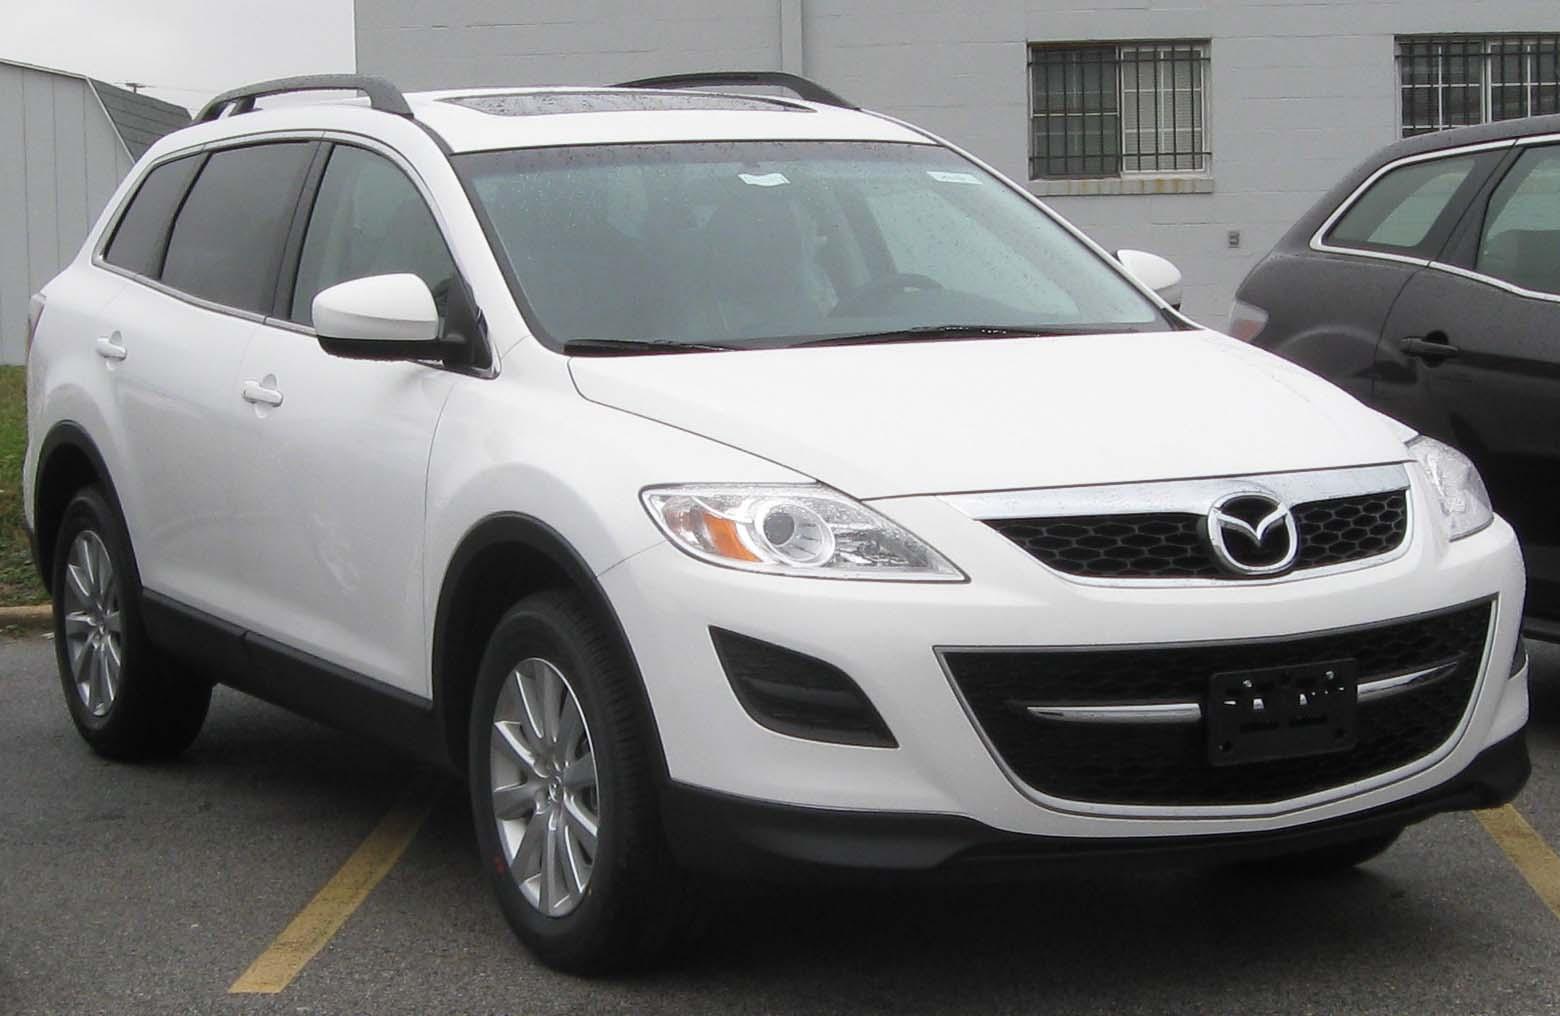 Feds Probe Braking Problems In Mazda CX-9